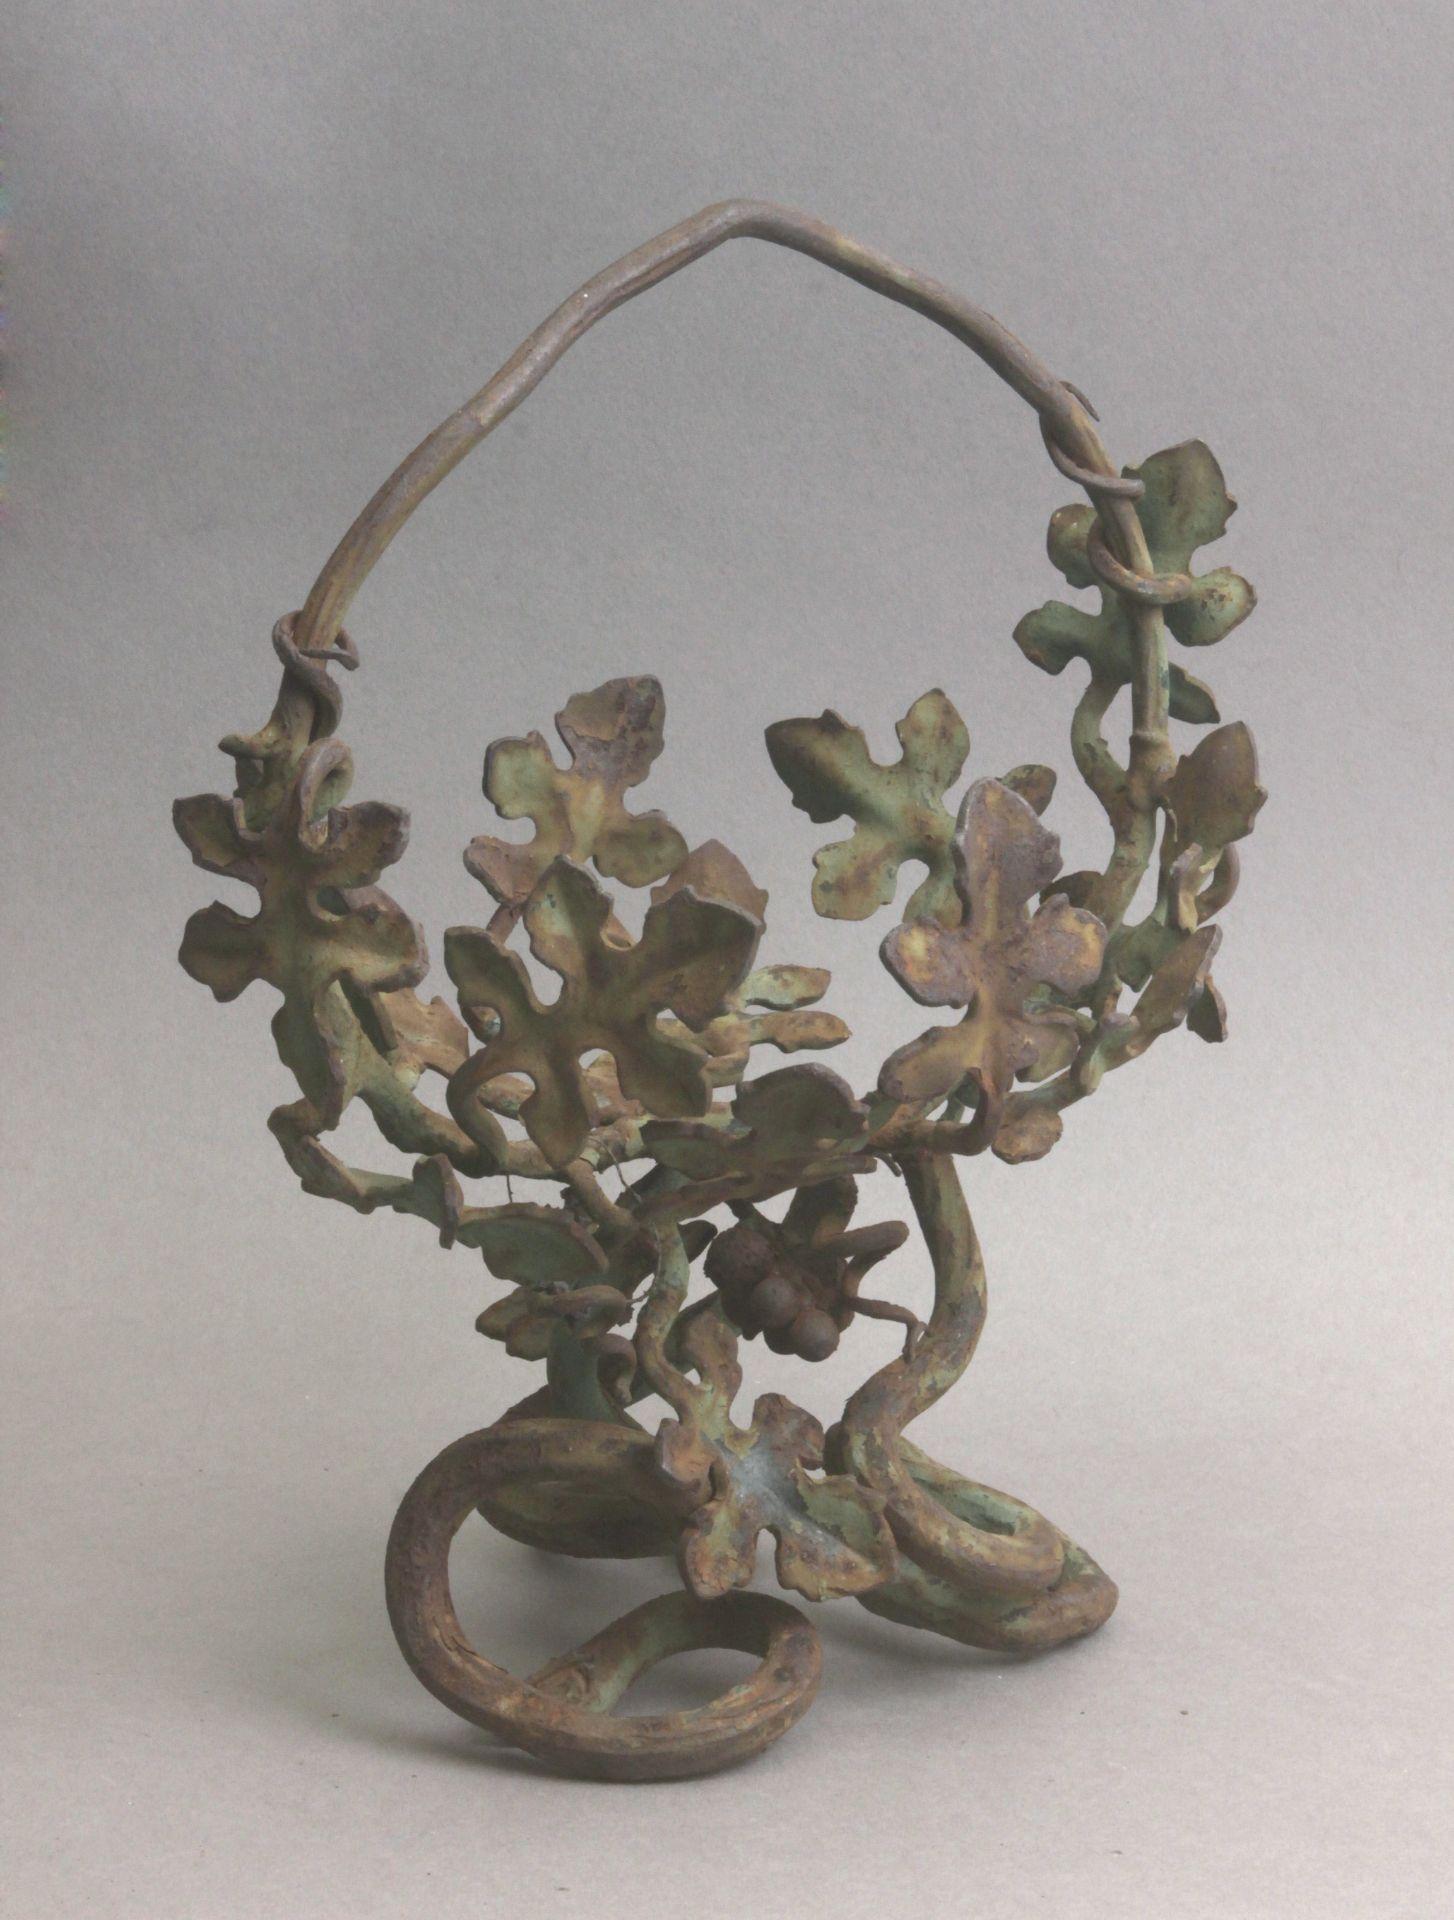 An Art Nouveau wrought iron jardiniere in the style of Manuel Ballarin in 1900 - Bild 3 aus 3